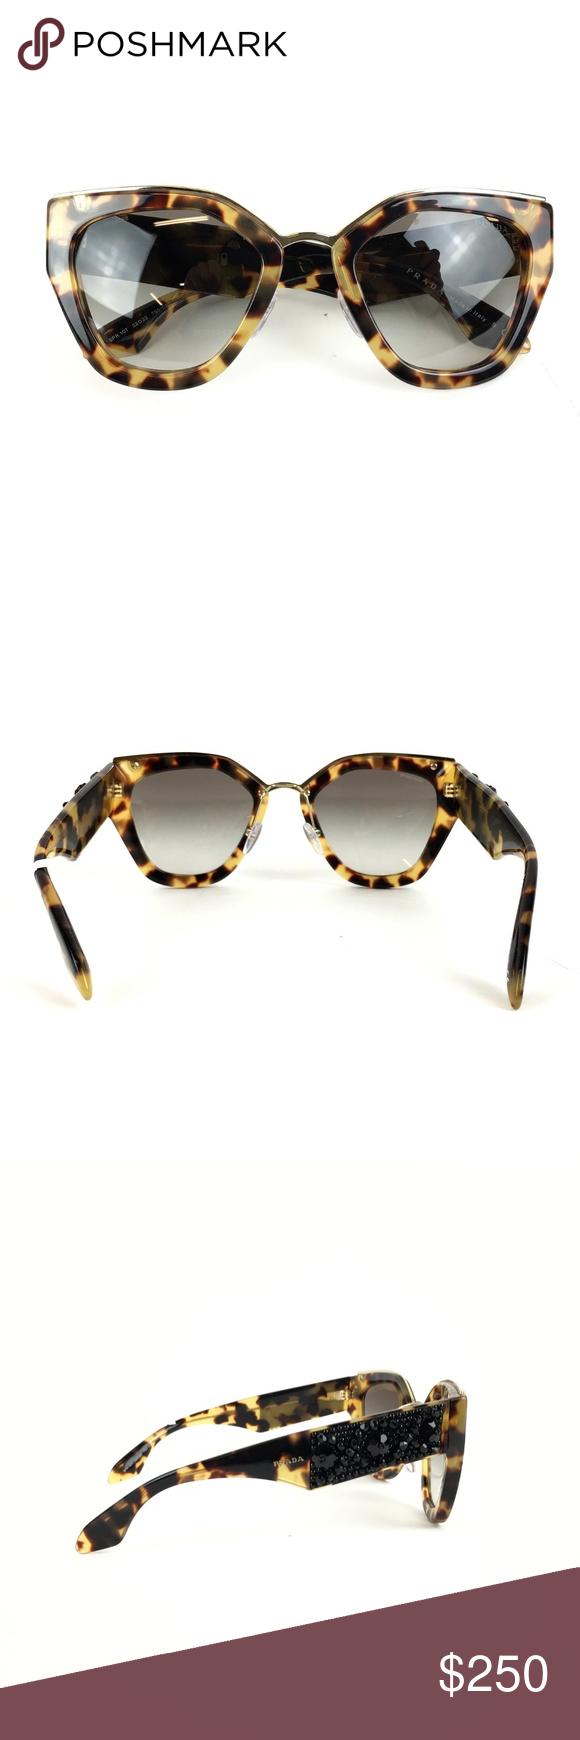 747d318e3ba Prada SPR 10T Sunglasses These Stunning Limited Edition Prada Cinema Cat  Eye Sunglasses feature a beautiful